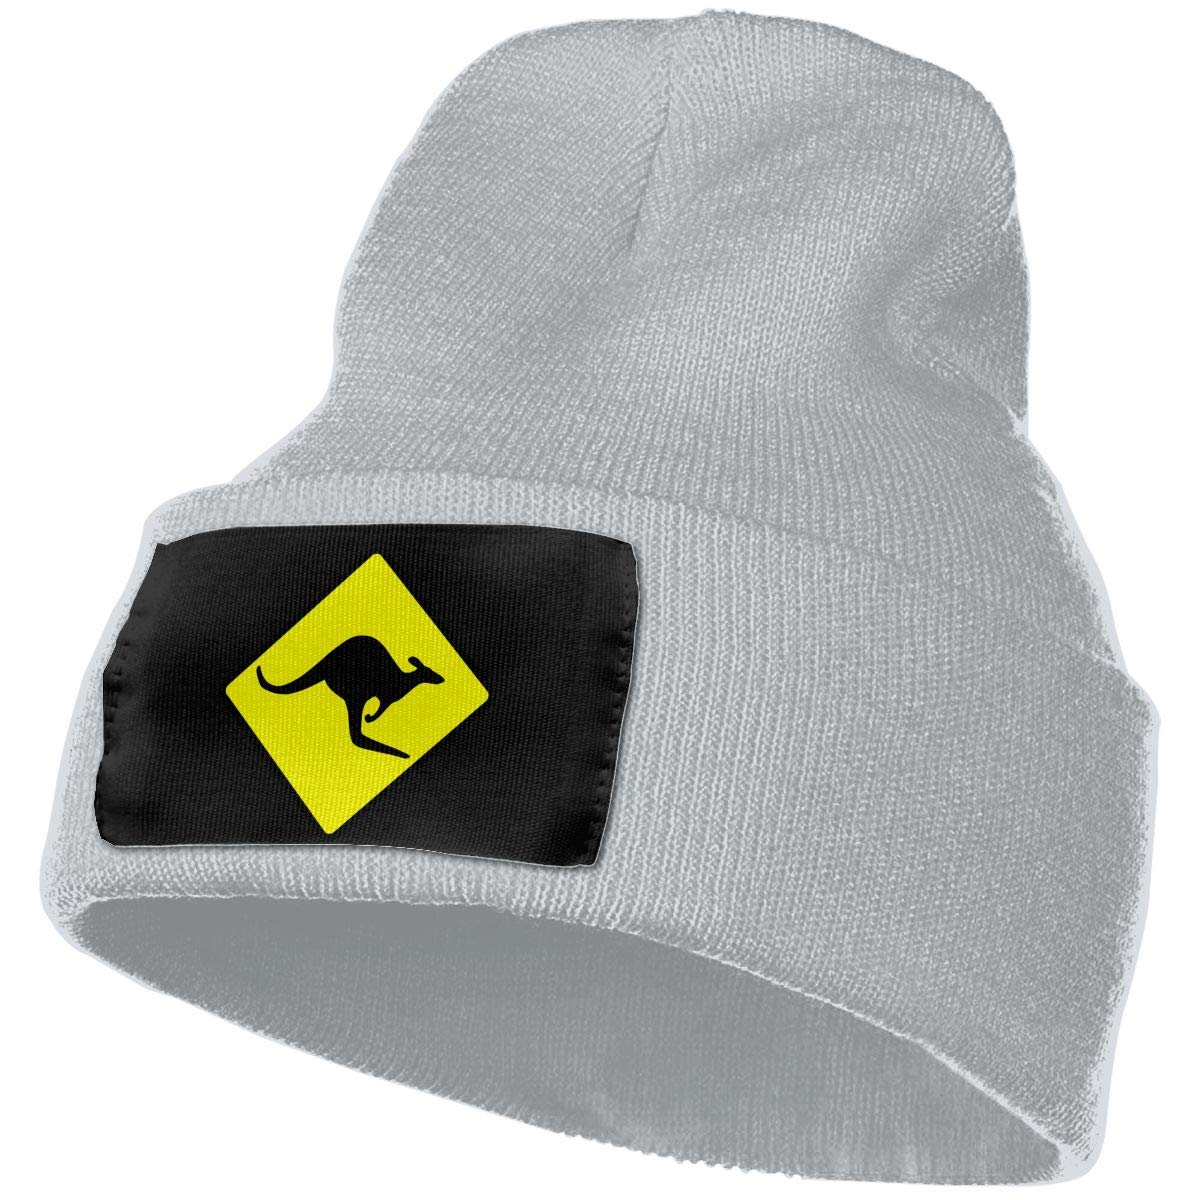 SLADDD1 Sign Warm Winter Hat Knit Beanie Skull Cap Cuff Beanie Hat Winter Hats for Men /& Women